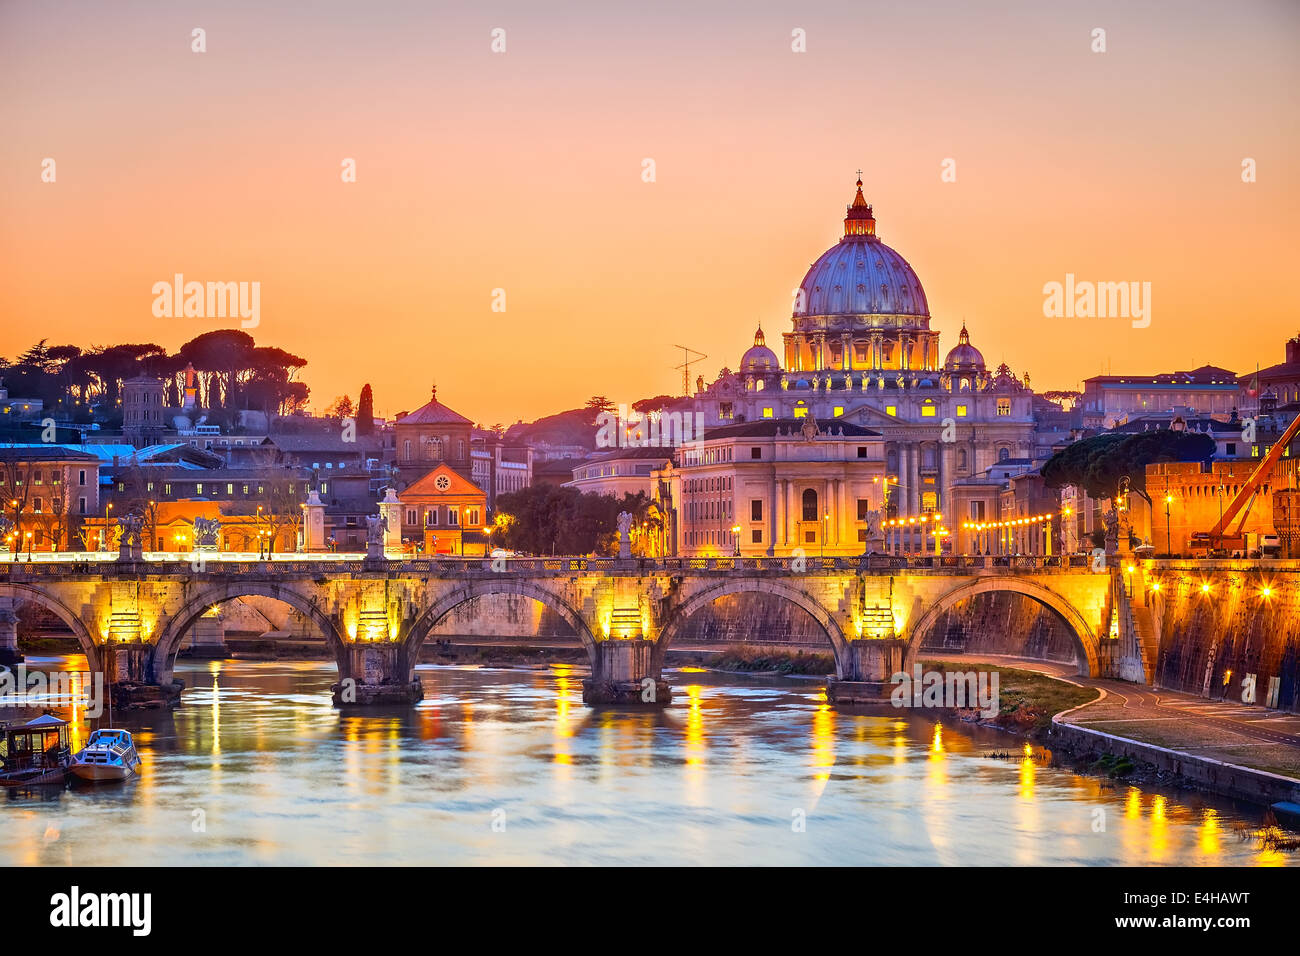 La catedral de San Pedro en la noche, Roma Imagen De Stock